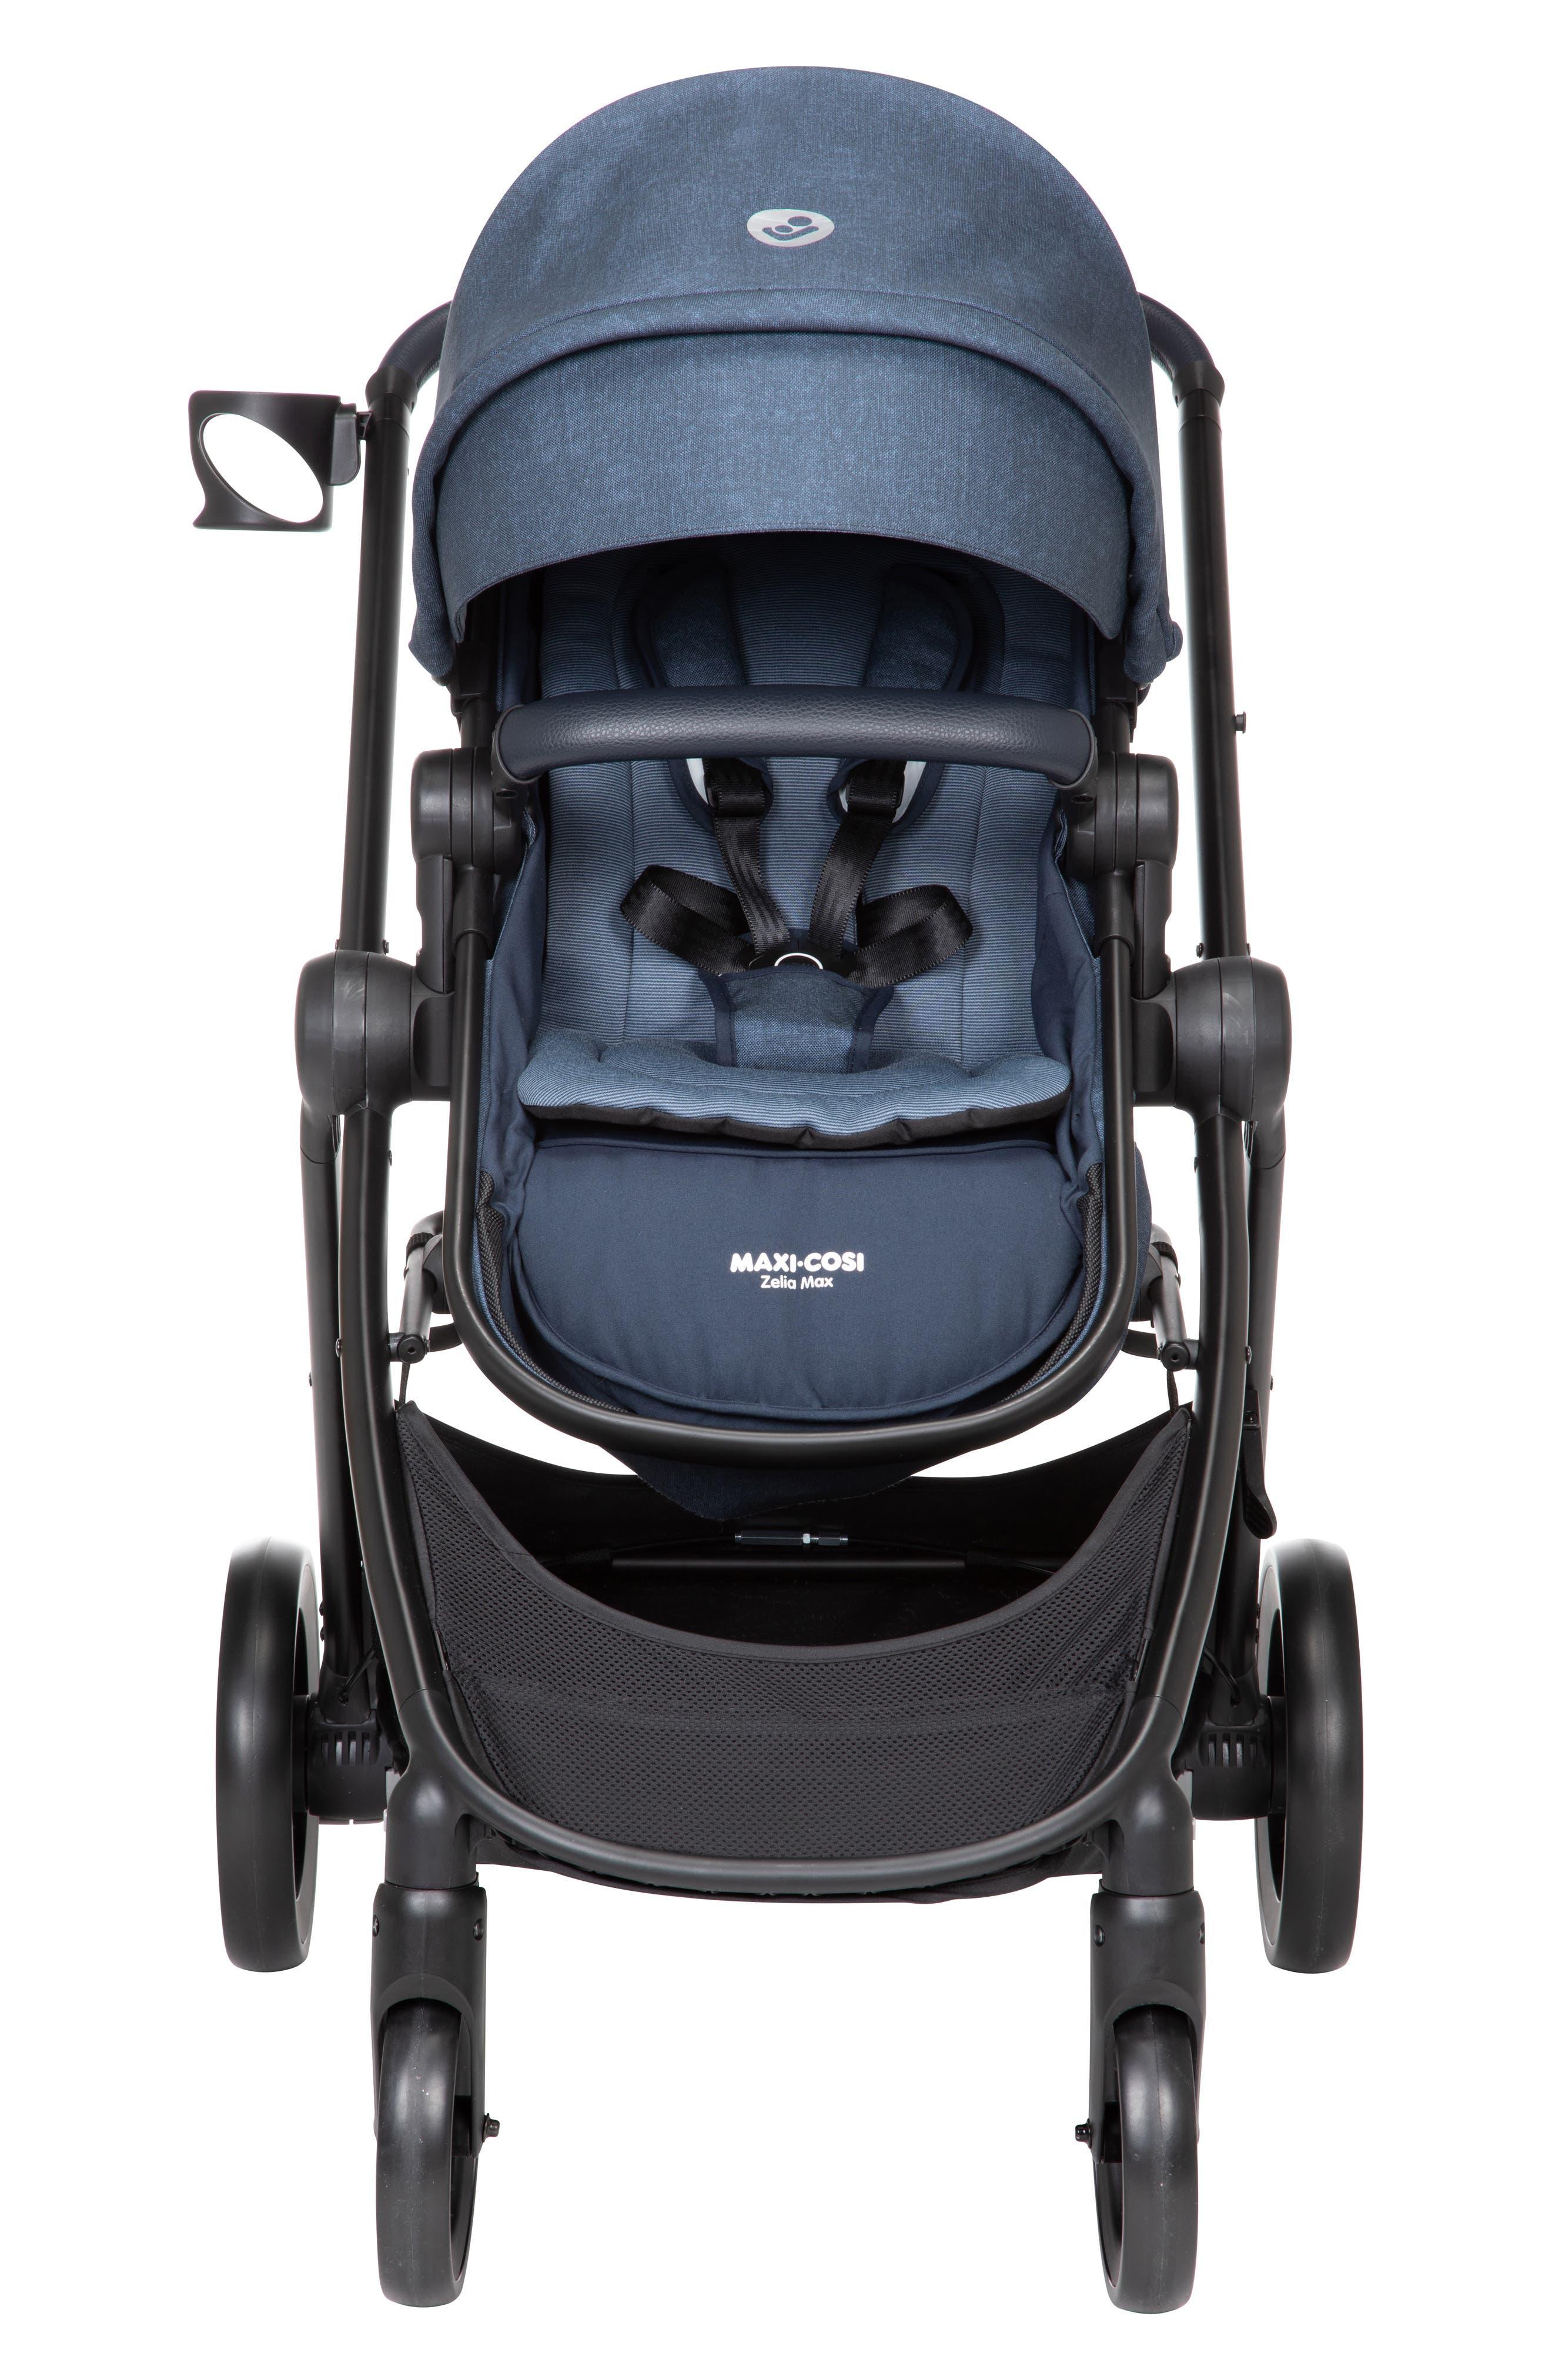 Infant MaxiCosi 51 Mico 30 Infant Car Seat  Zelia Stroller Modular Travel System Size One Size  Blue